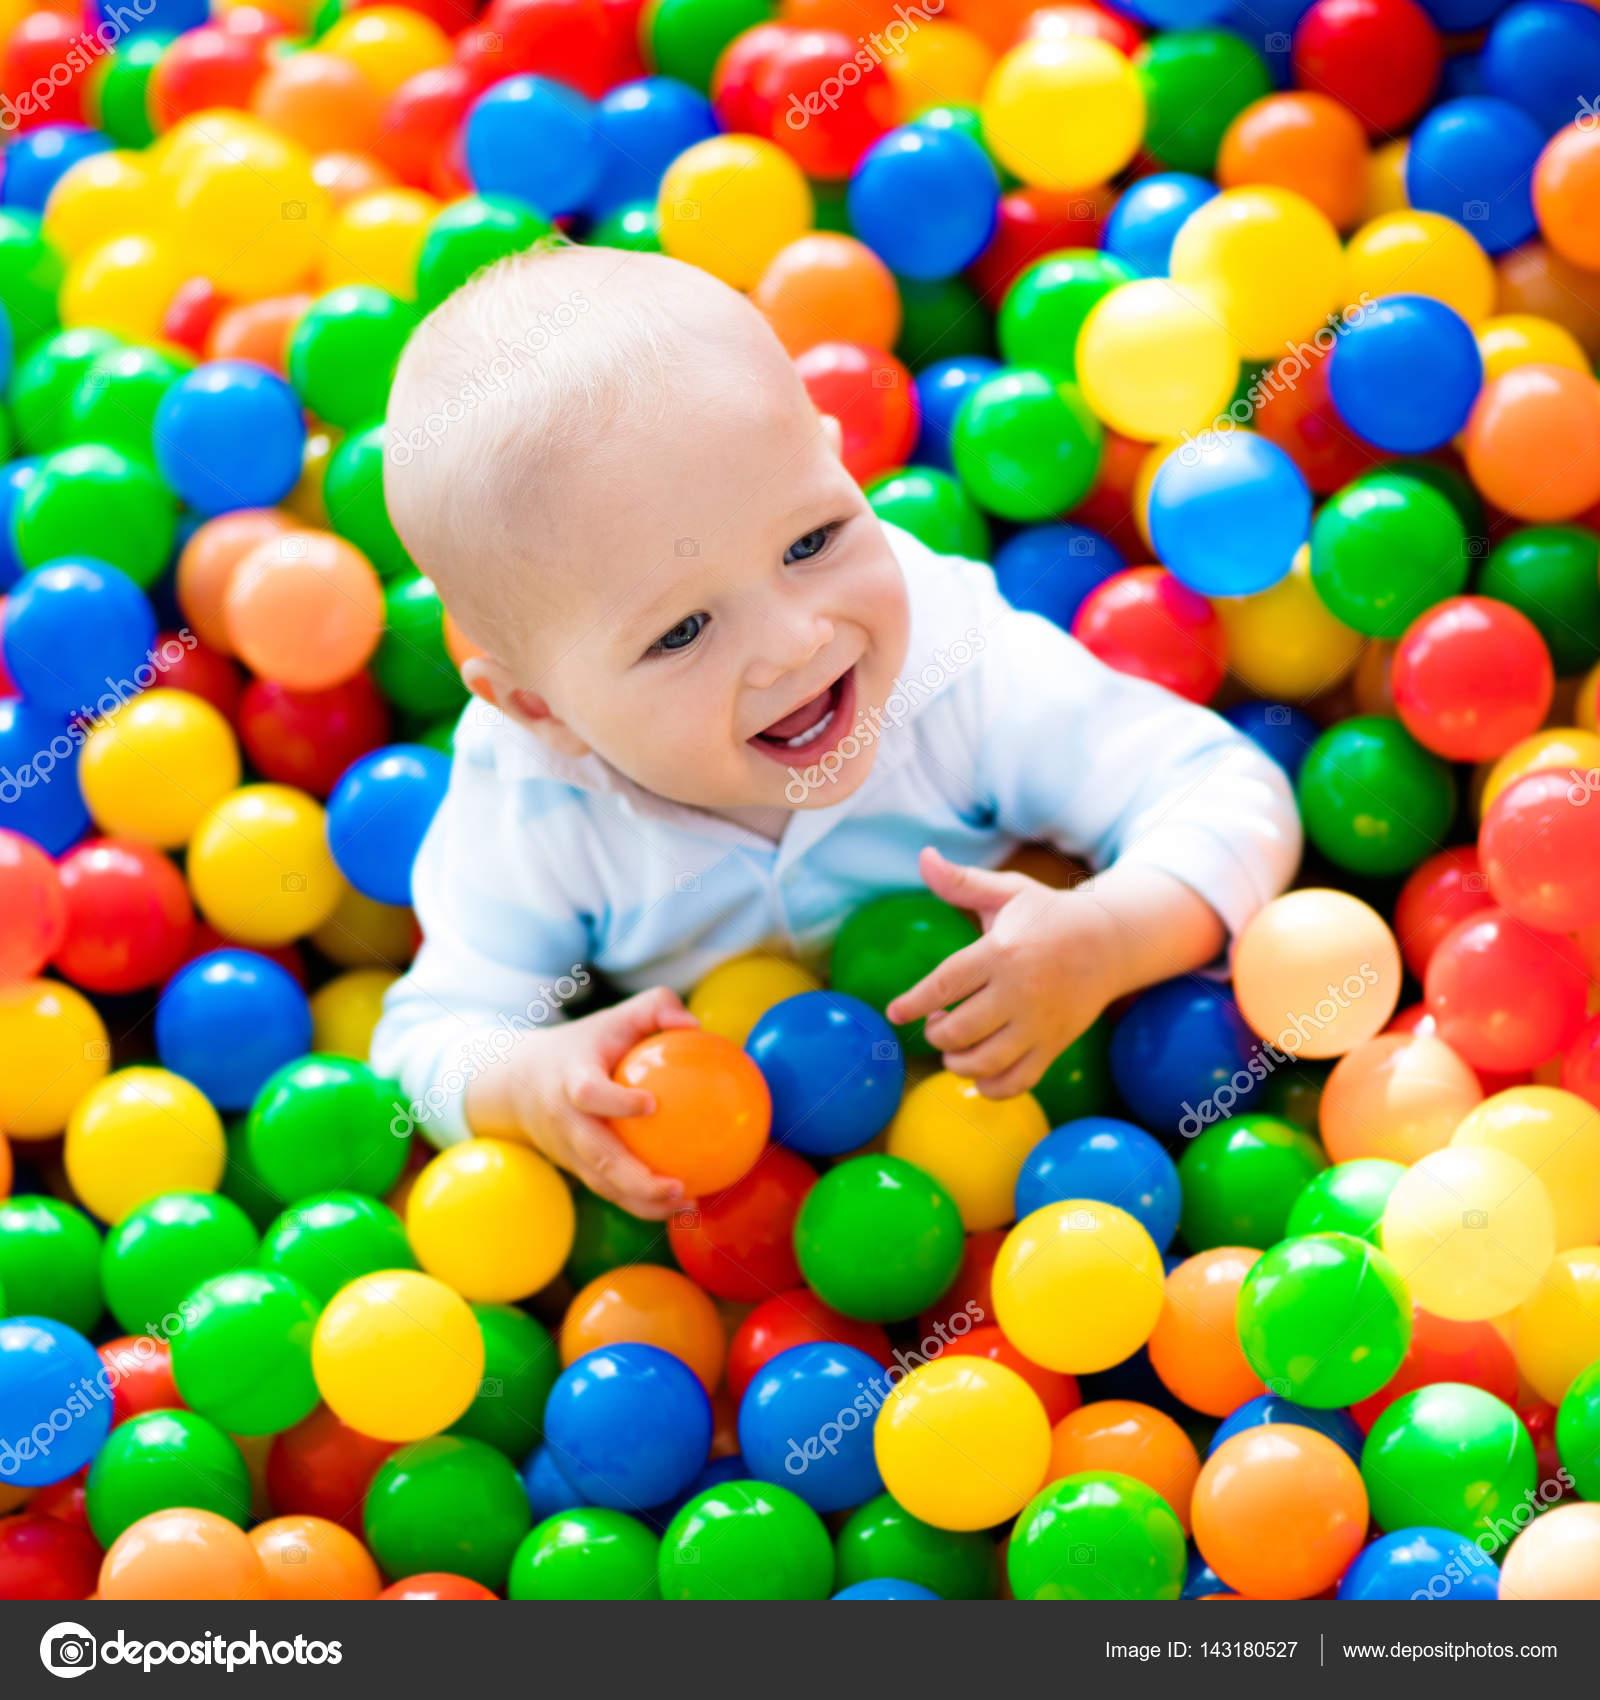 Crian a brincando na piscina de bolas no playground indoor for Piscina de bolas para bebes